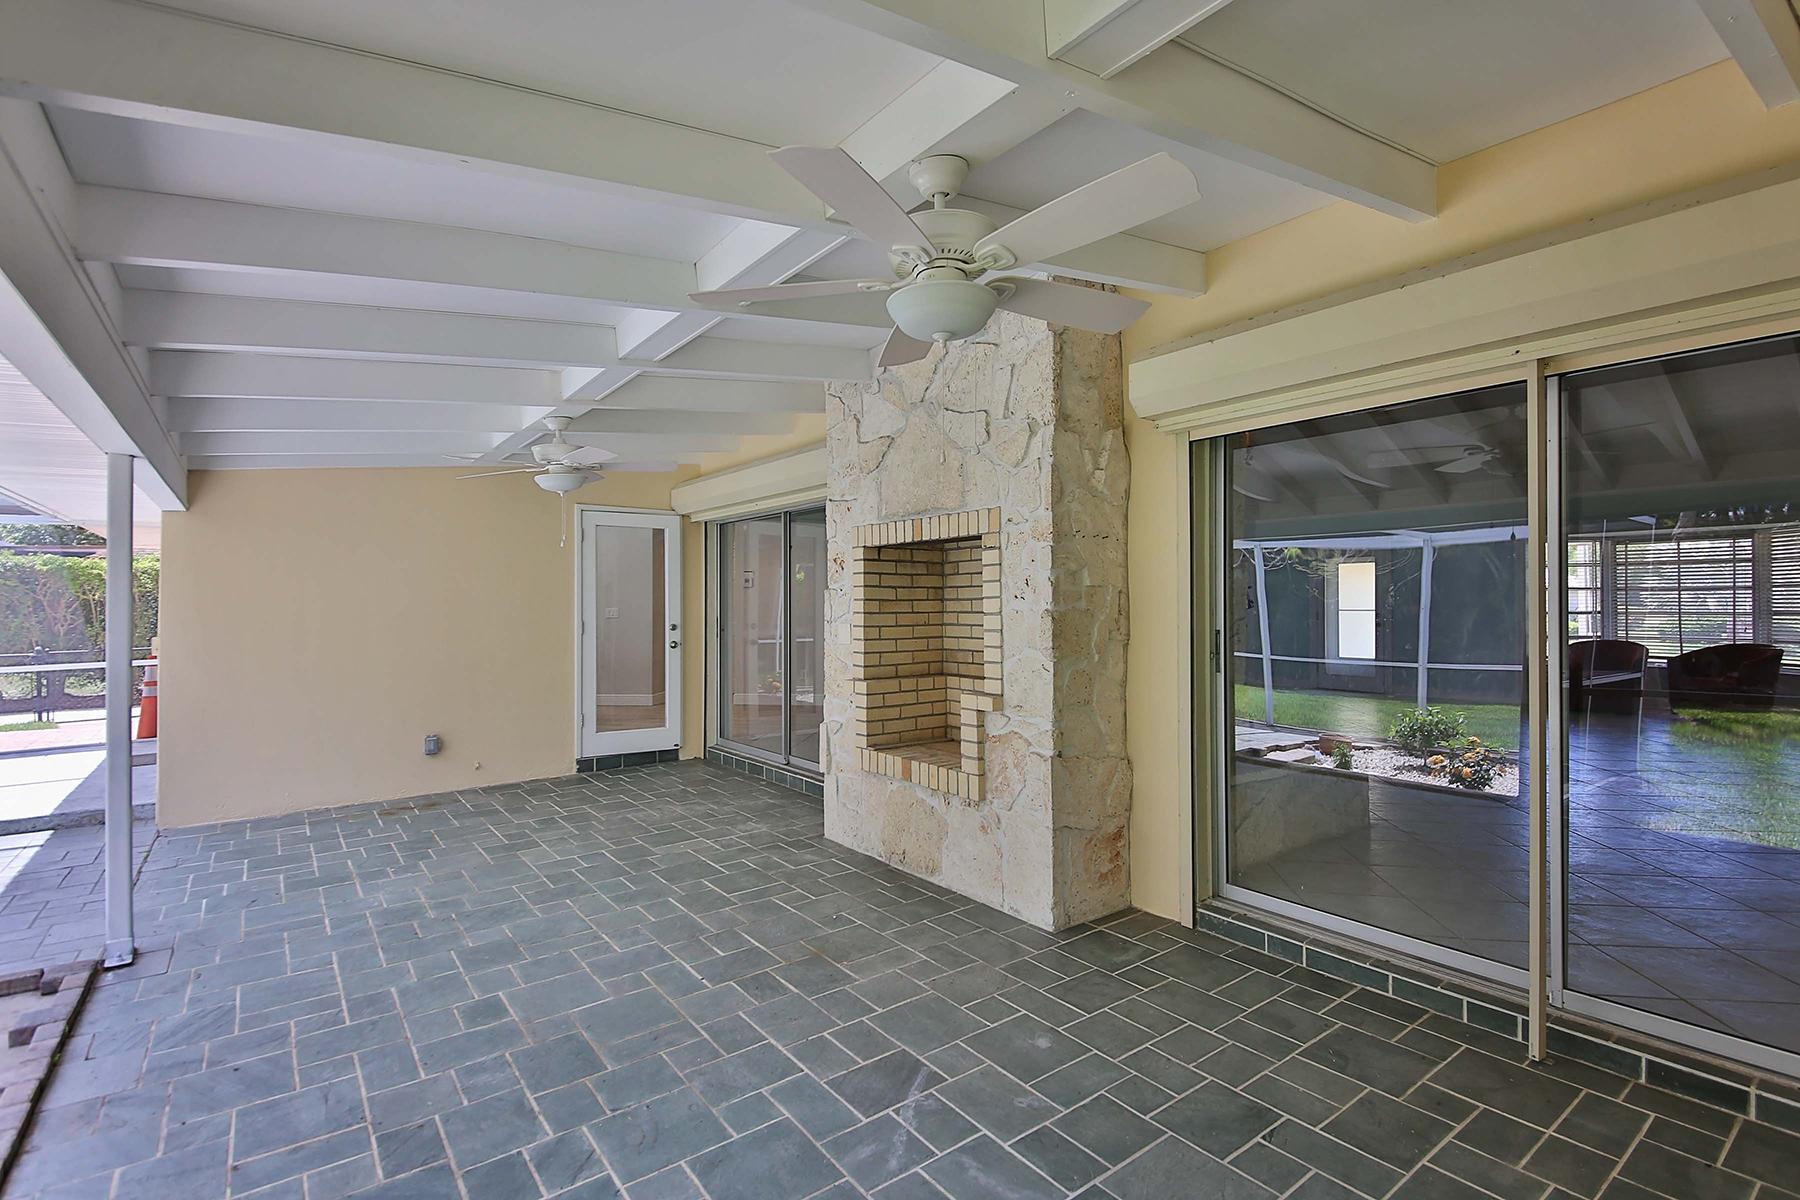 Additional photo for property listing at MARCO ISLAND 267  Shadowridge Ct,  Marco Island, Florida 34145 United States